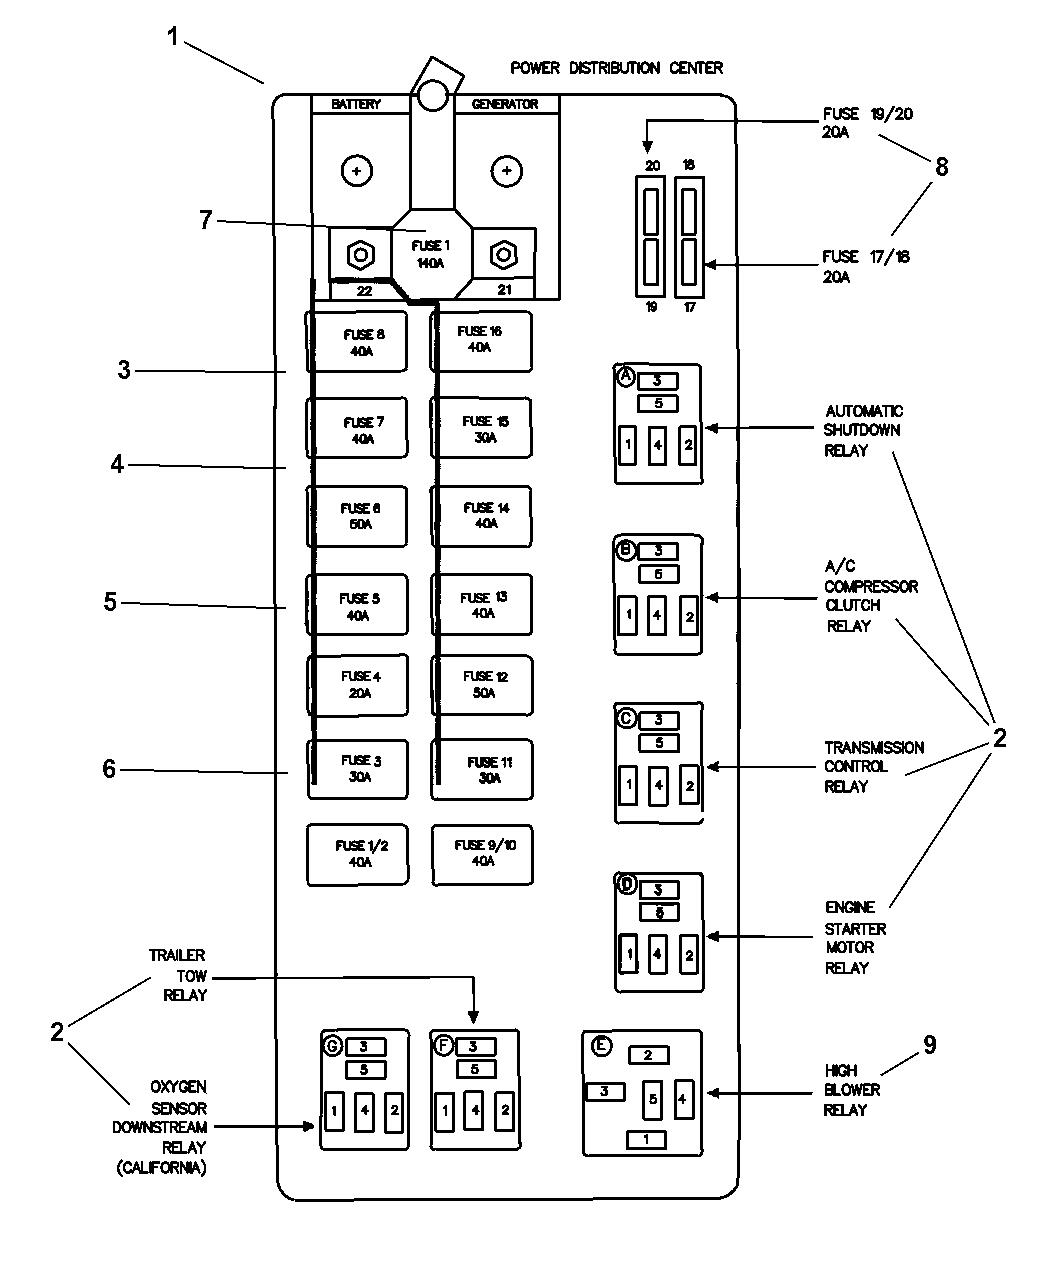 2002 Dodge Ram Van Power Distribution Center Relays Amp Fuses